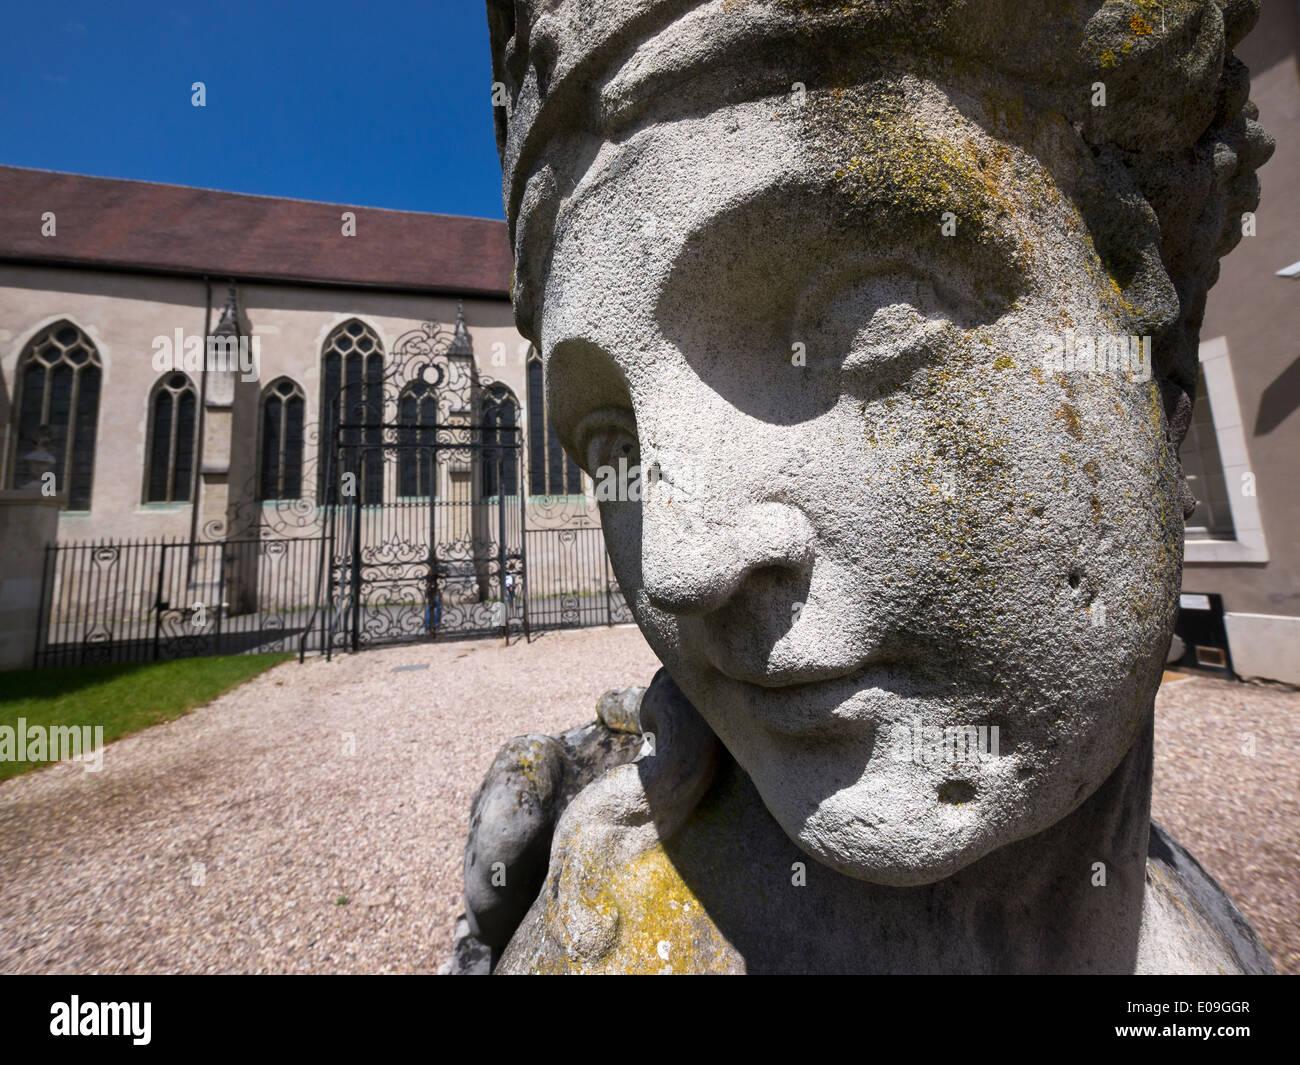 France, Nancy, Statue in garden of Musee lorrain - Stock Image